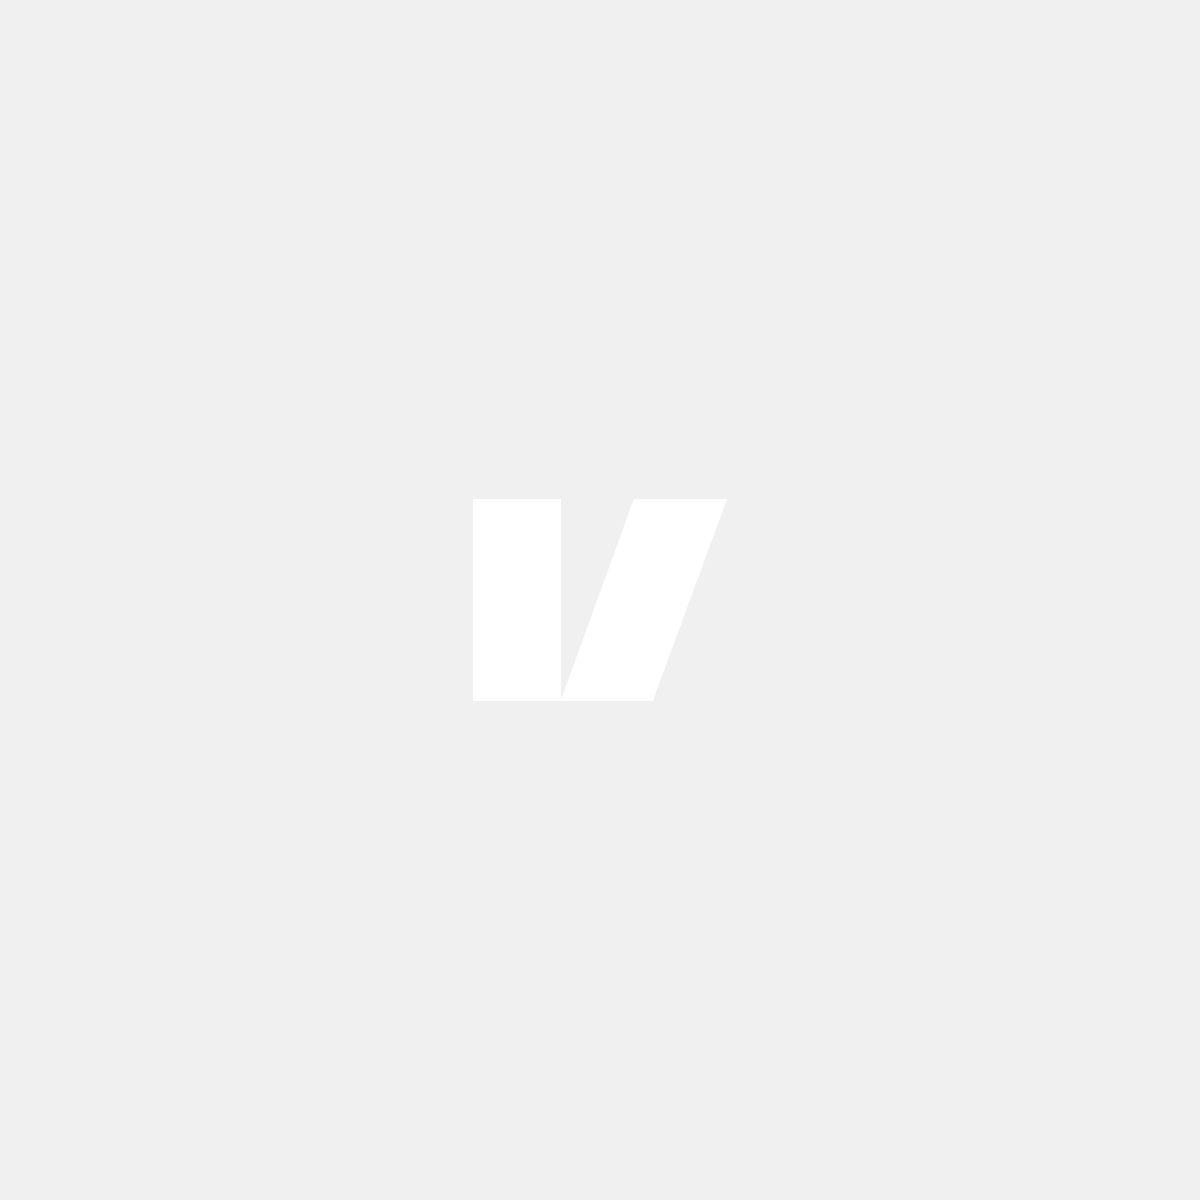 Iridium vinge till Volvo V70, XC70 00-07